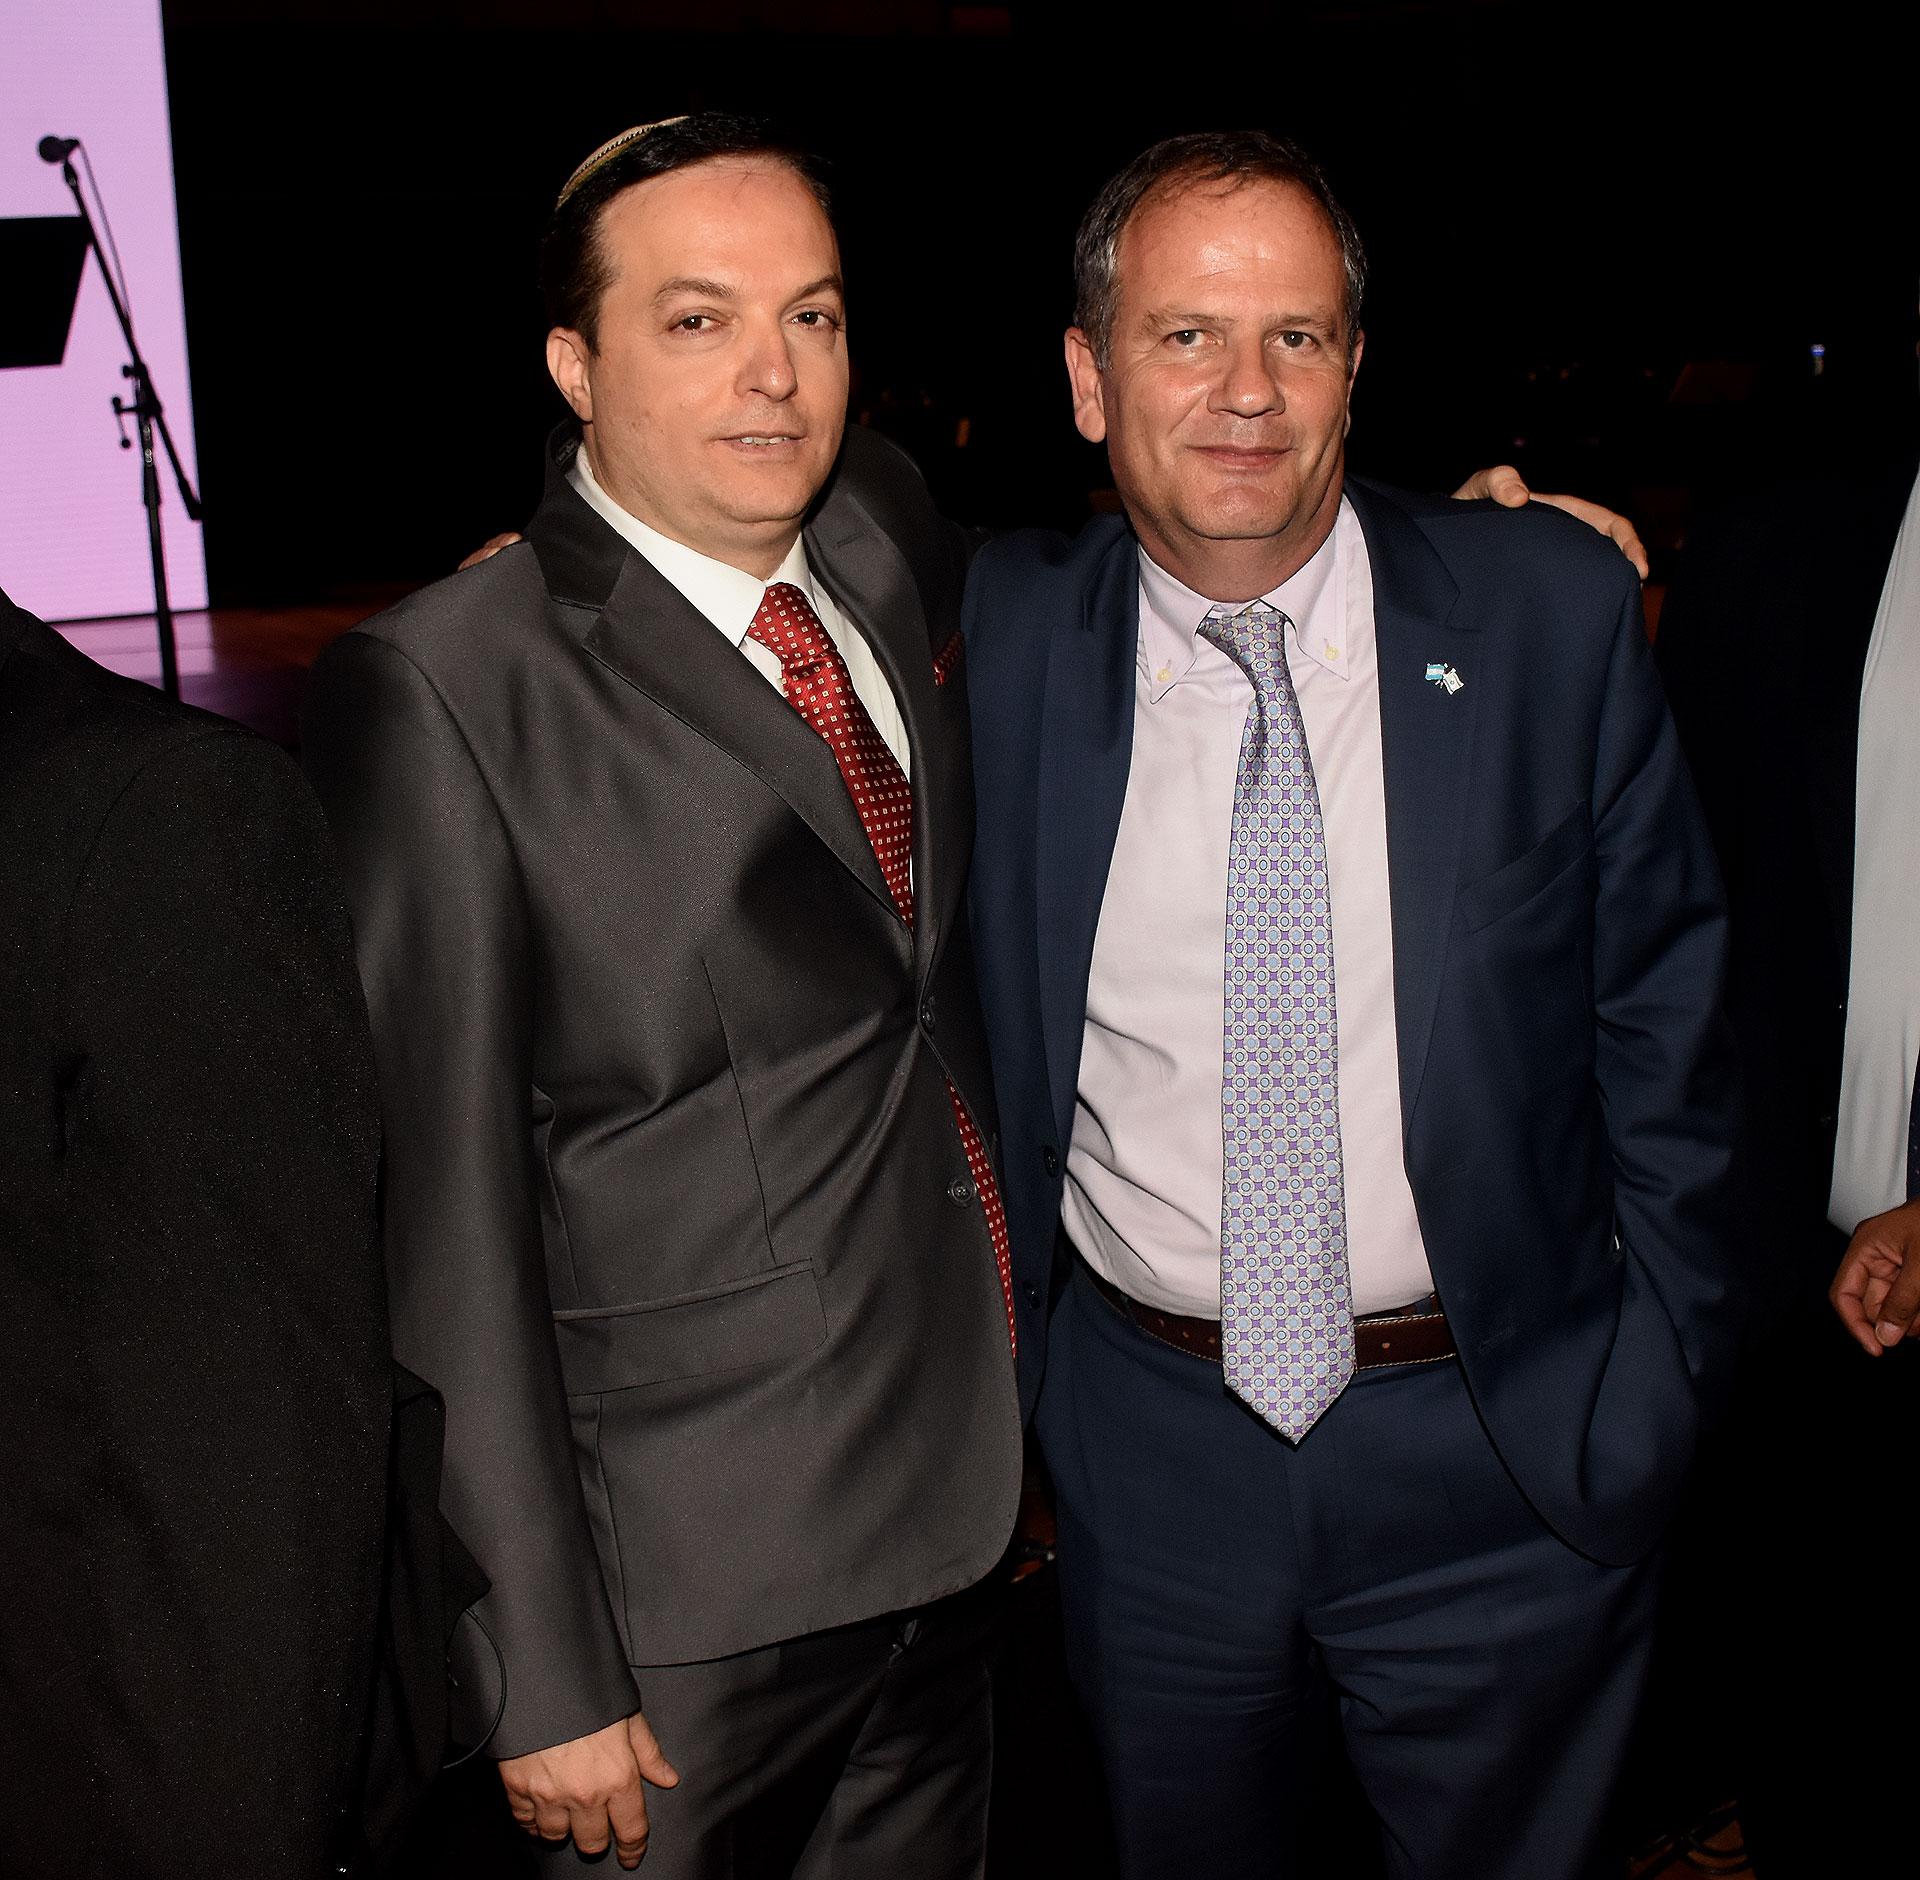 Ariel Cohen Sabban junto al embajador de Israel en la Argentina, Ilan Sztulman